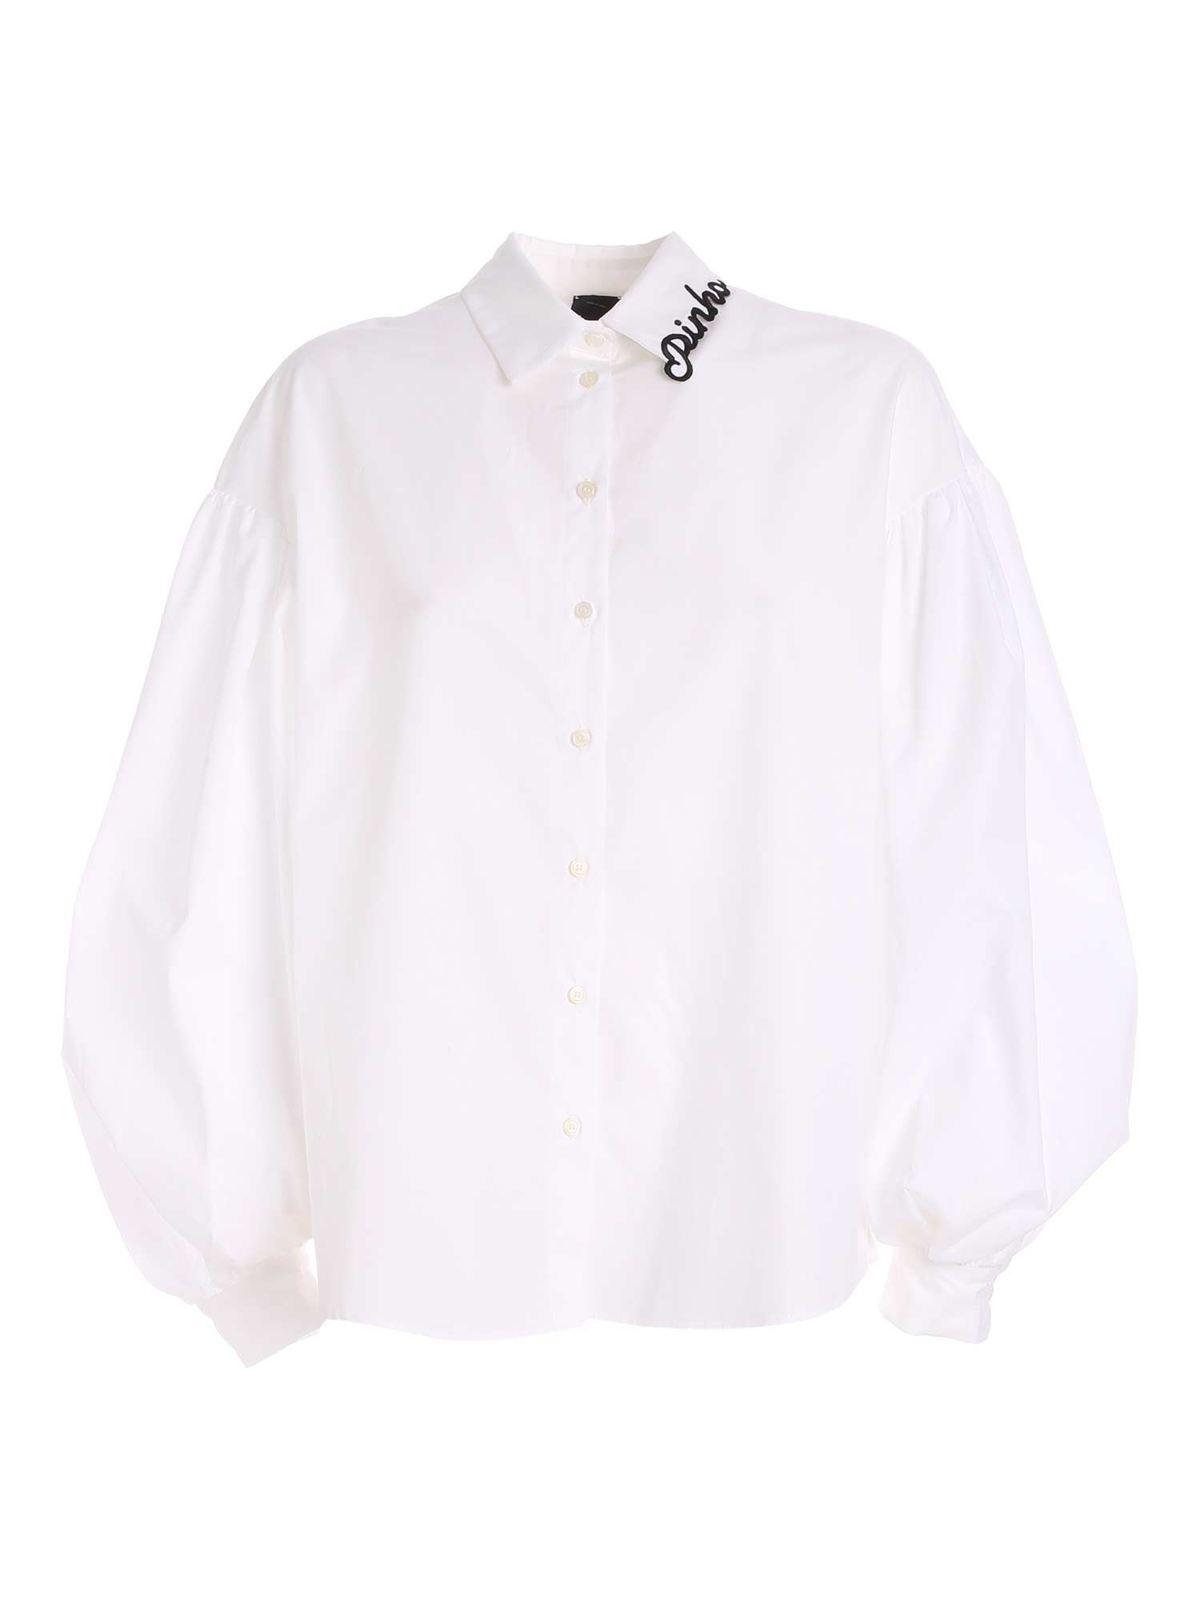 Pinko RAGIONERIA T-SHIRT IN WHITE